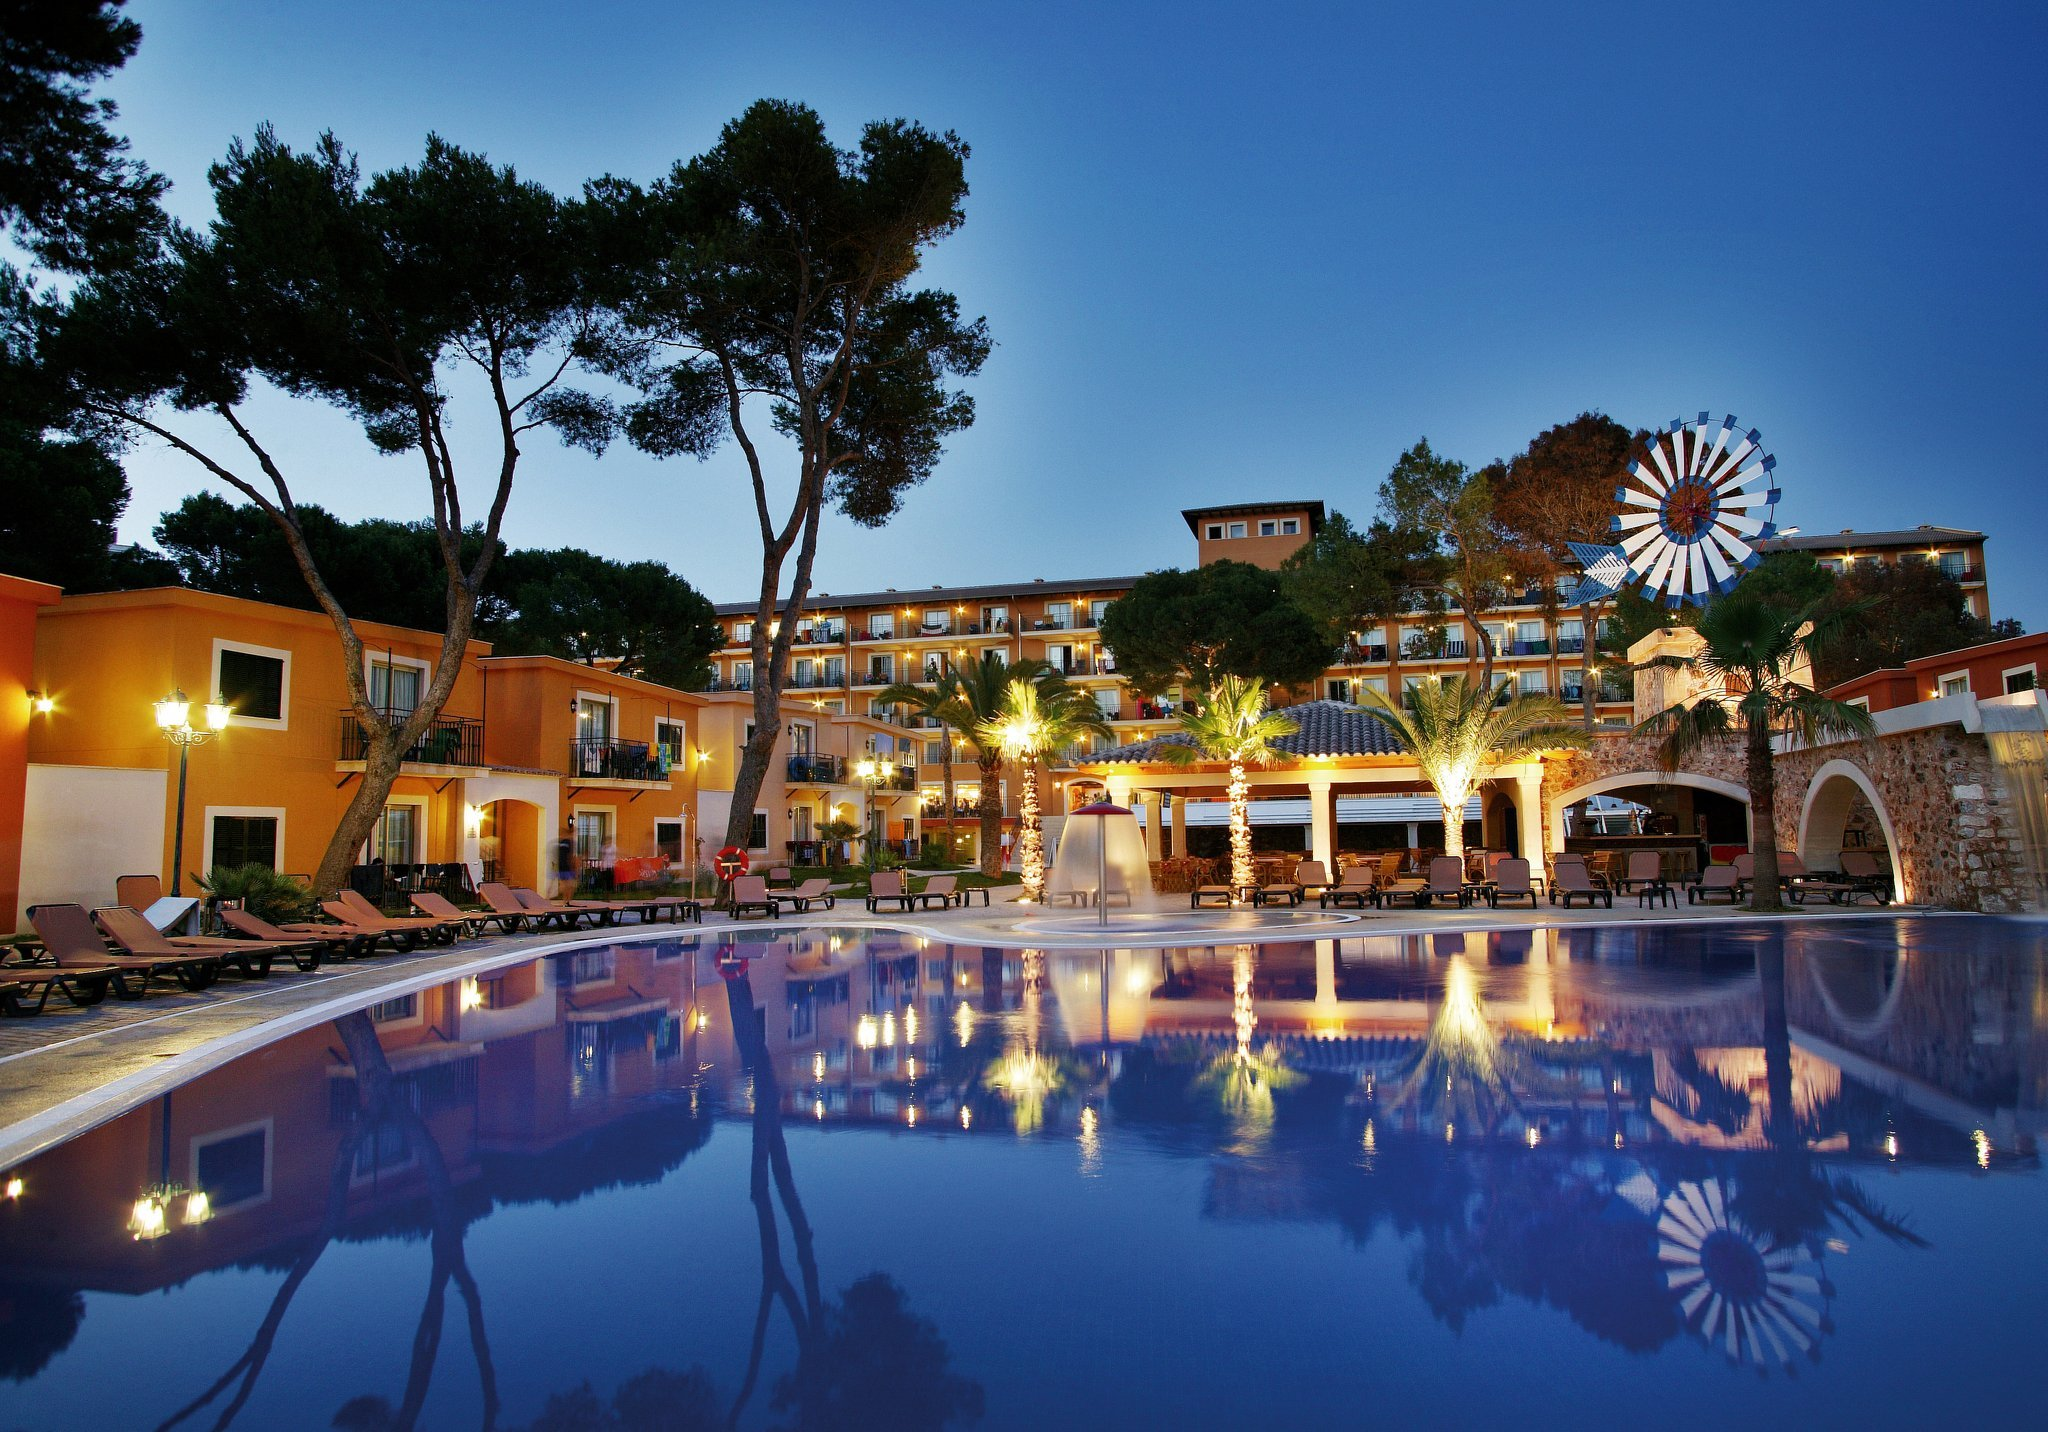 Barcel bilbao nervi n promodispo for Barcelo paris hotels